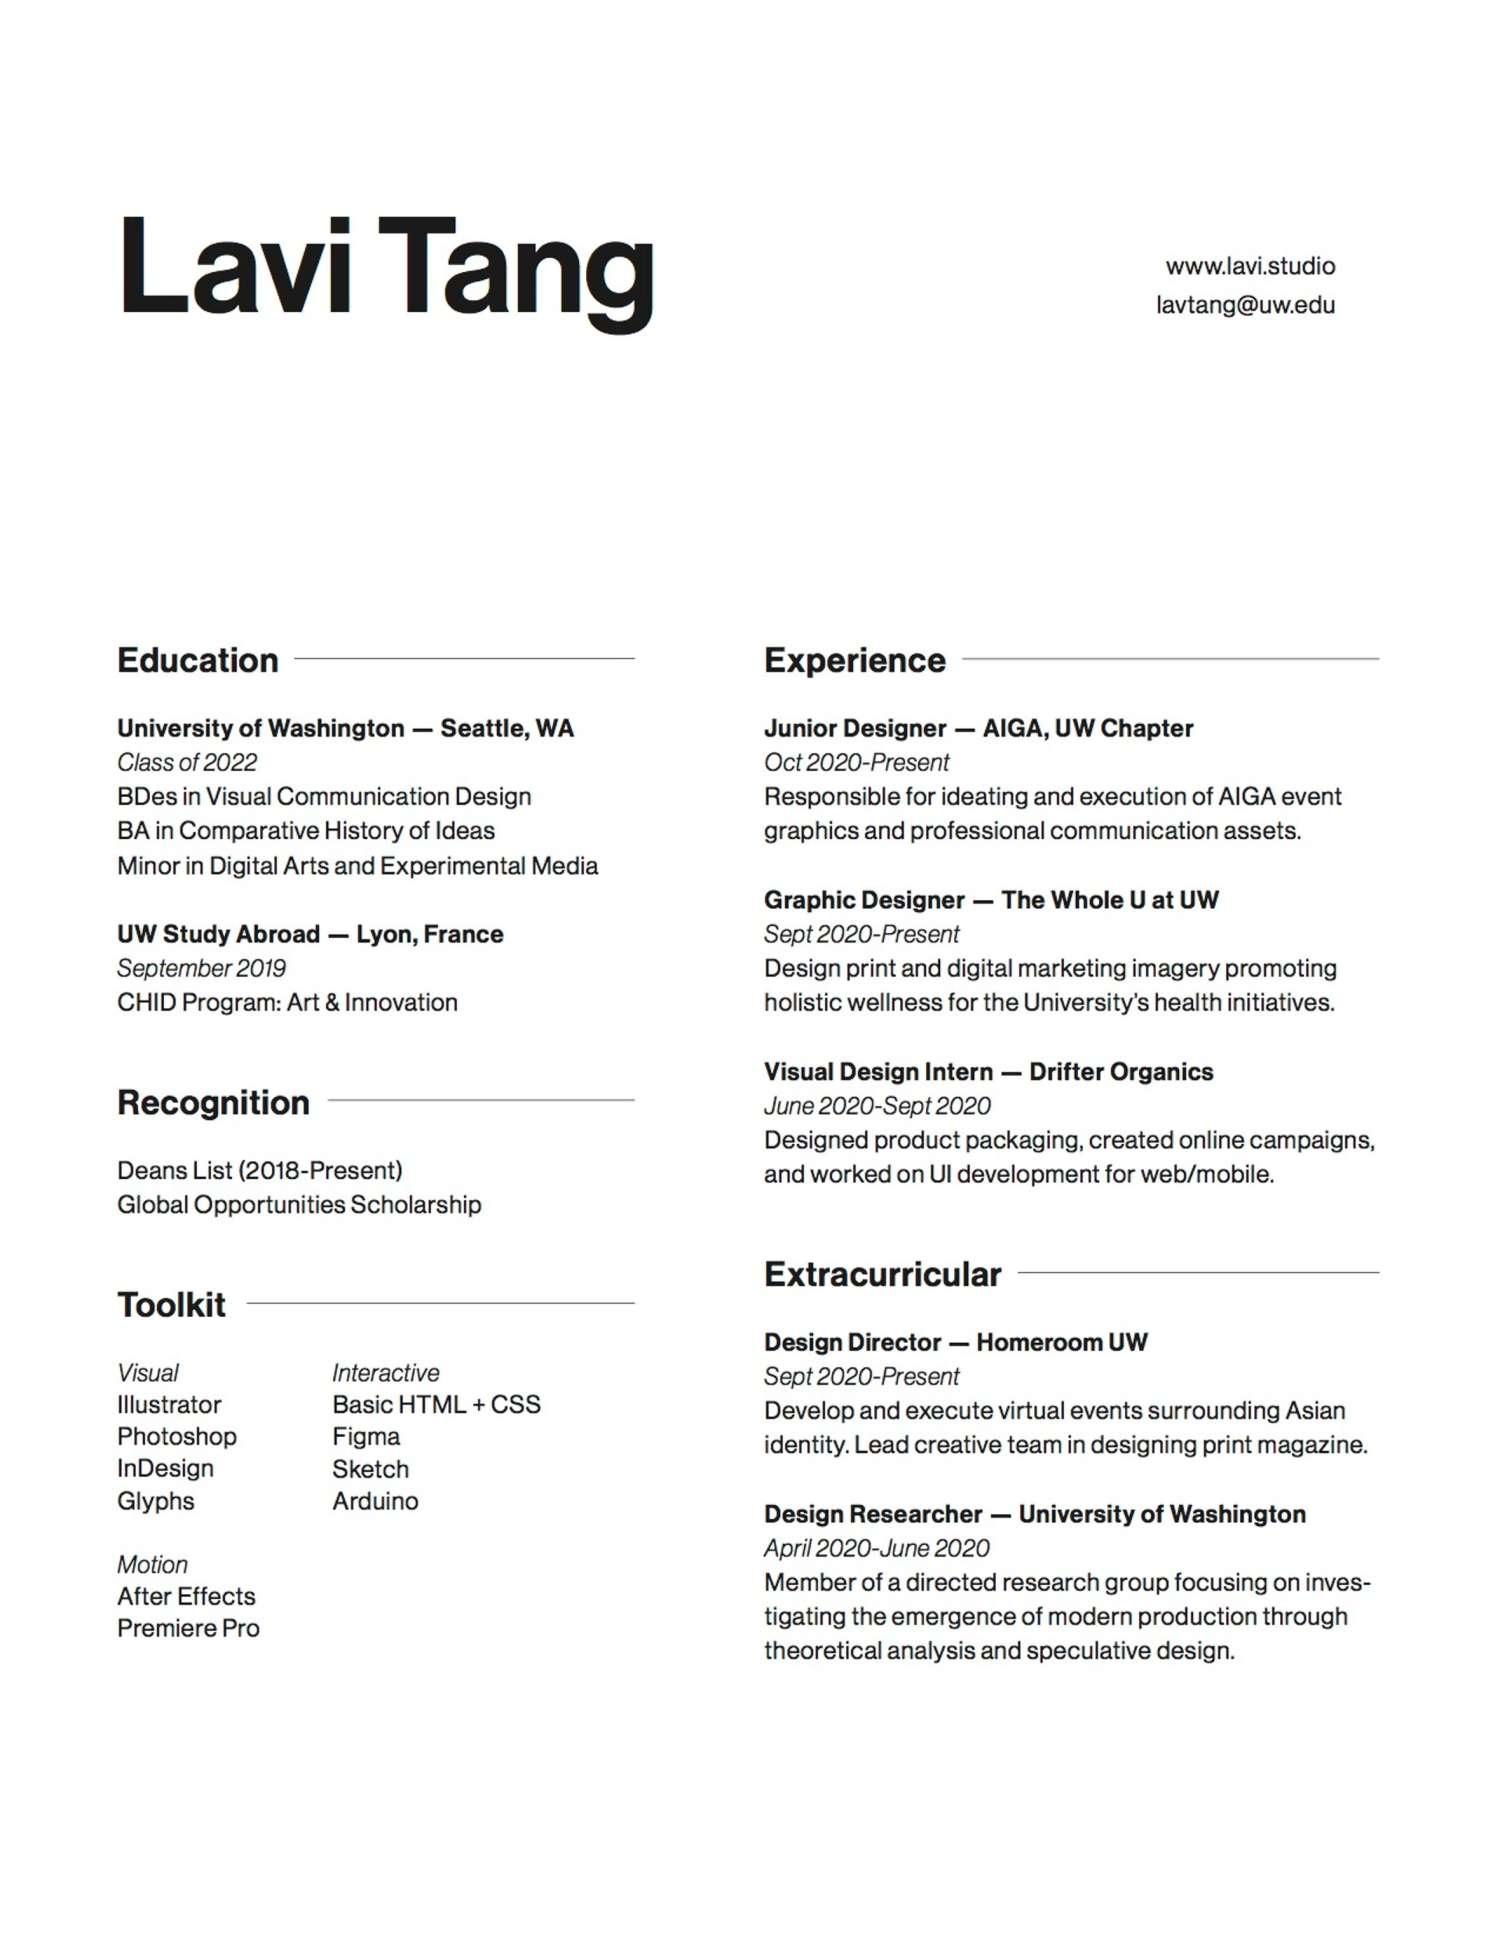 Lavi Tang's resume